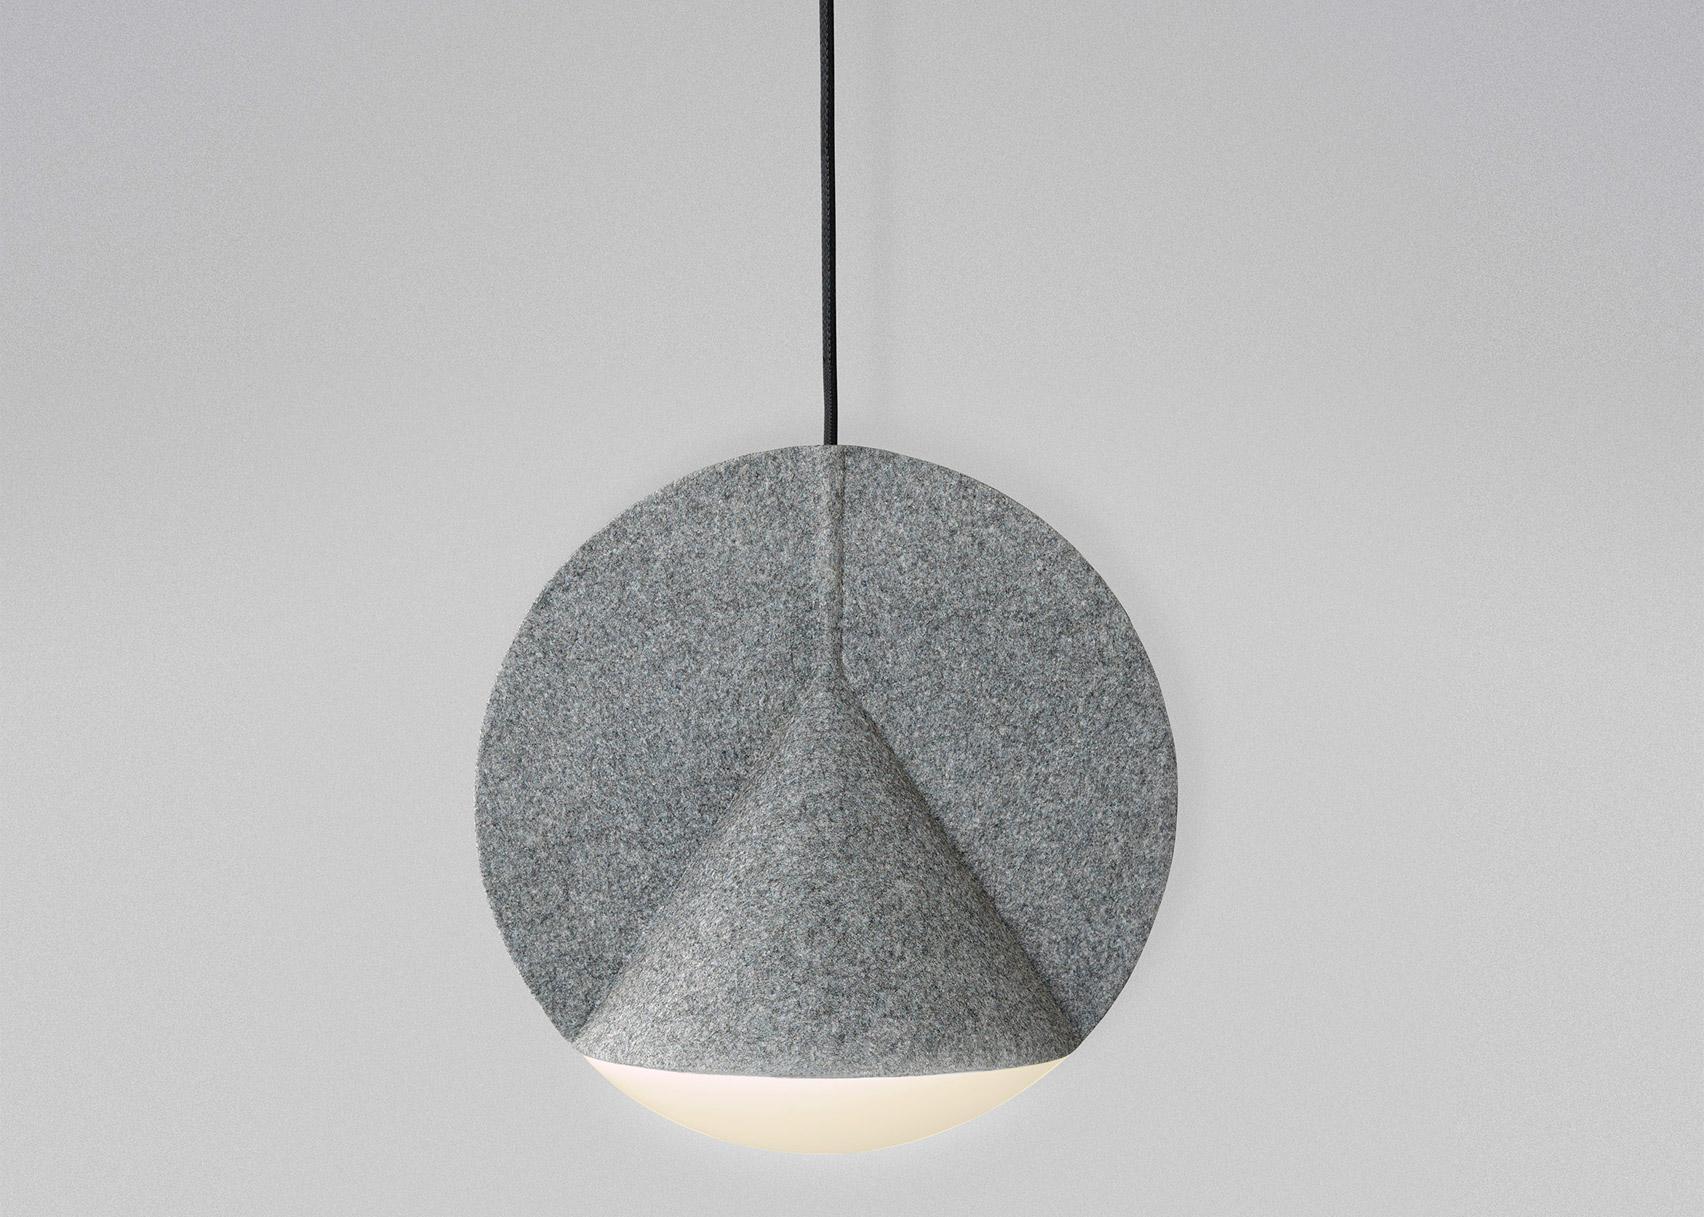 Outofstock designs geometric felt lamps for Bolia